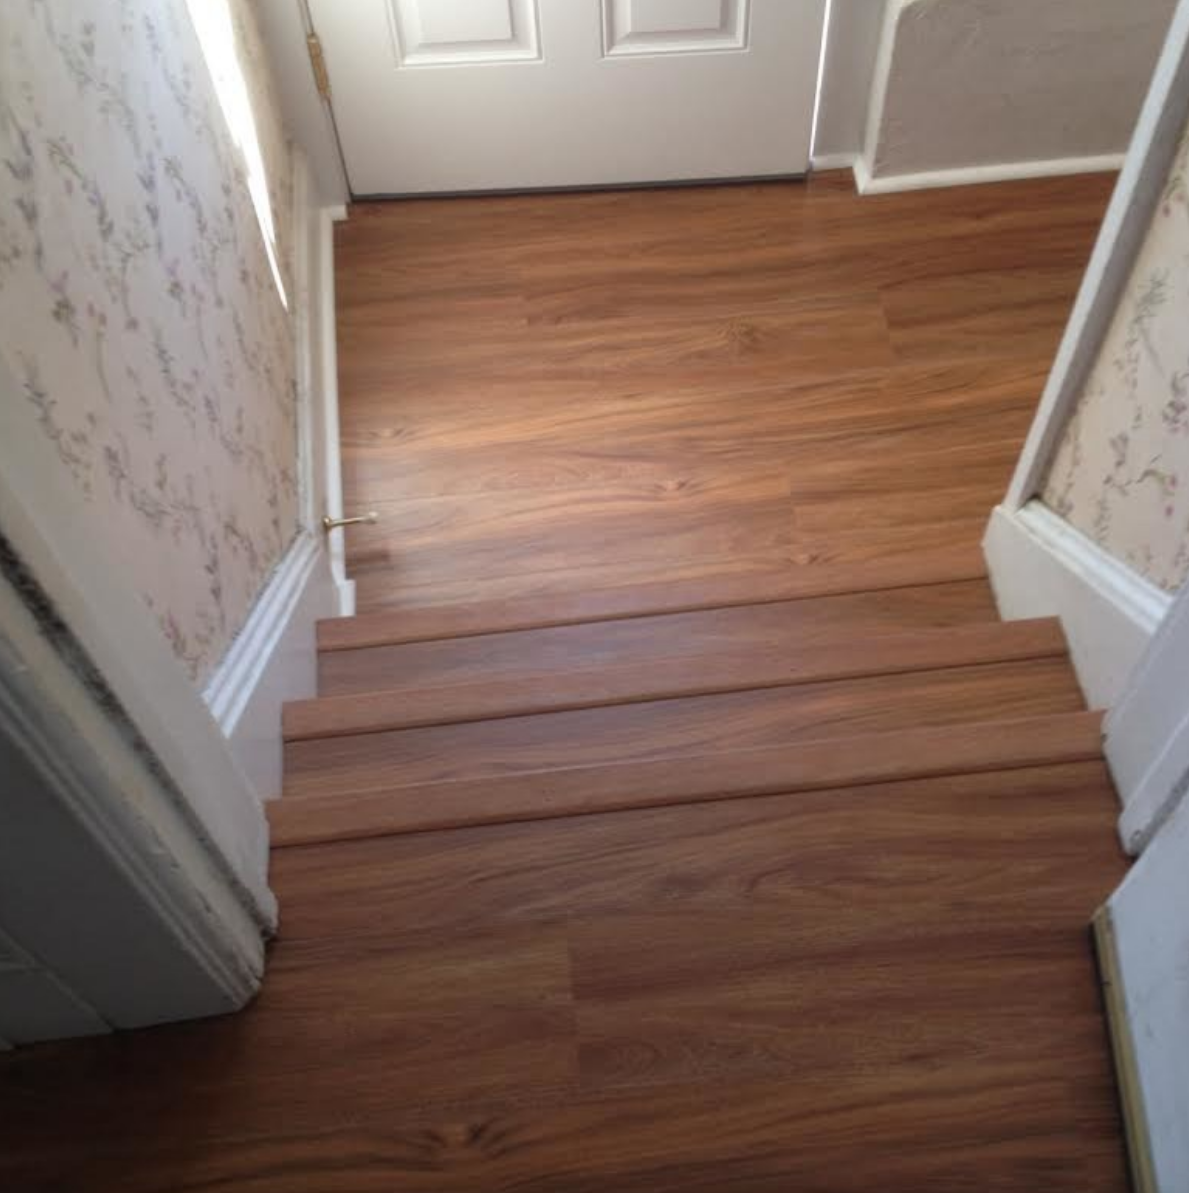 Coretec Lvt Unsure Which Color Possibly Dakota Walnut Flooring Hardwood Floors Flooring Room